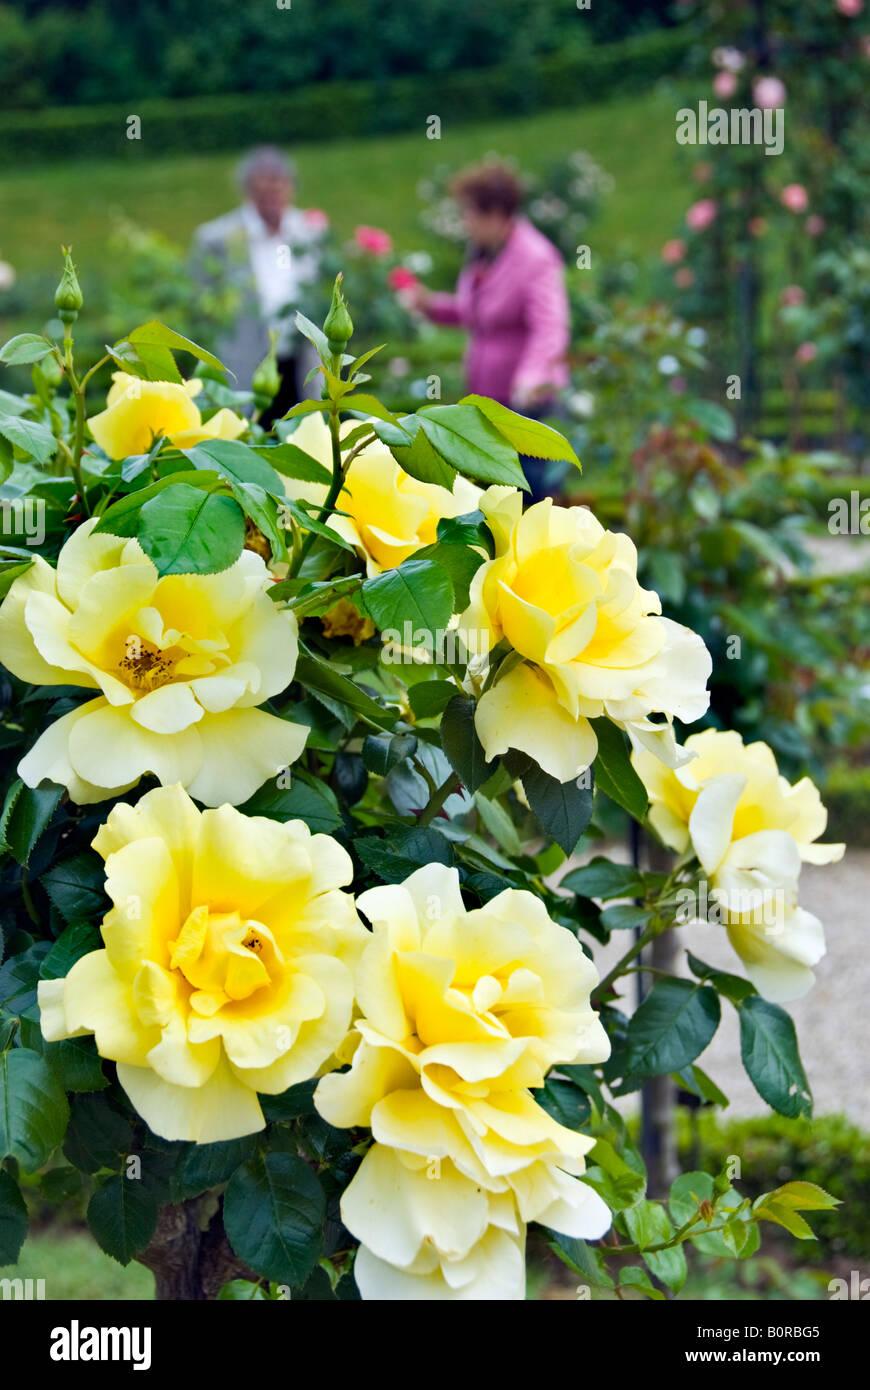 "Paris France, Public Parks People Visiting Bagatelle Rose Garden in Boulogne Park, Detail ""Mary Cave Harmite"" Rose Stock Photo"